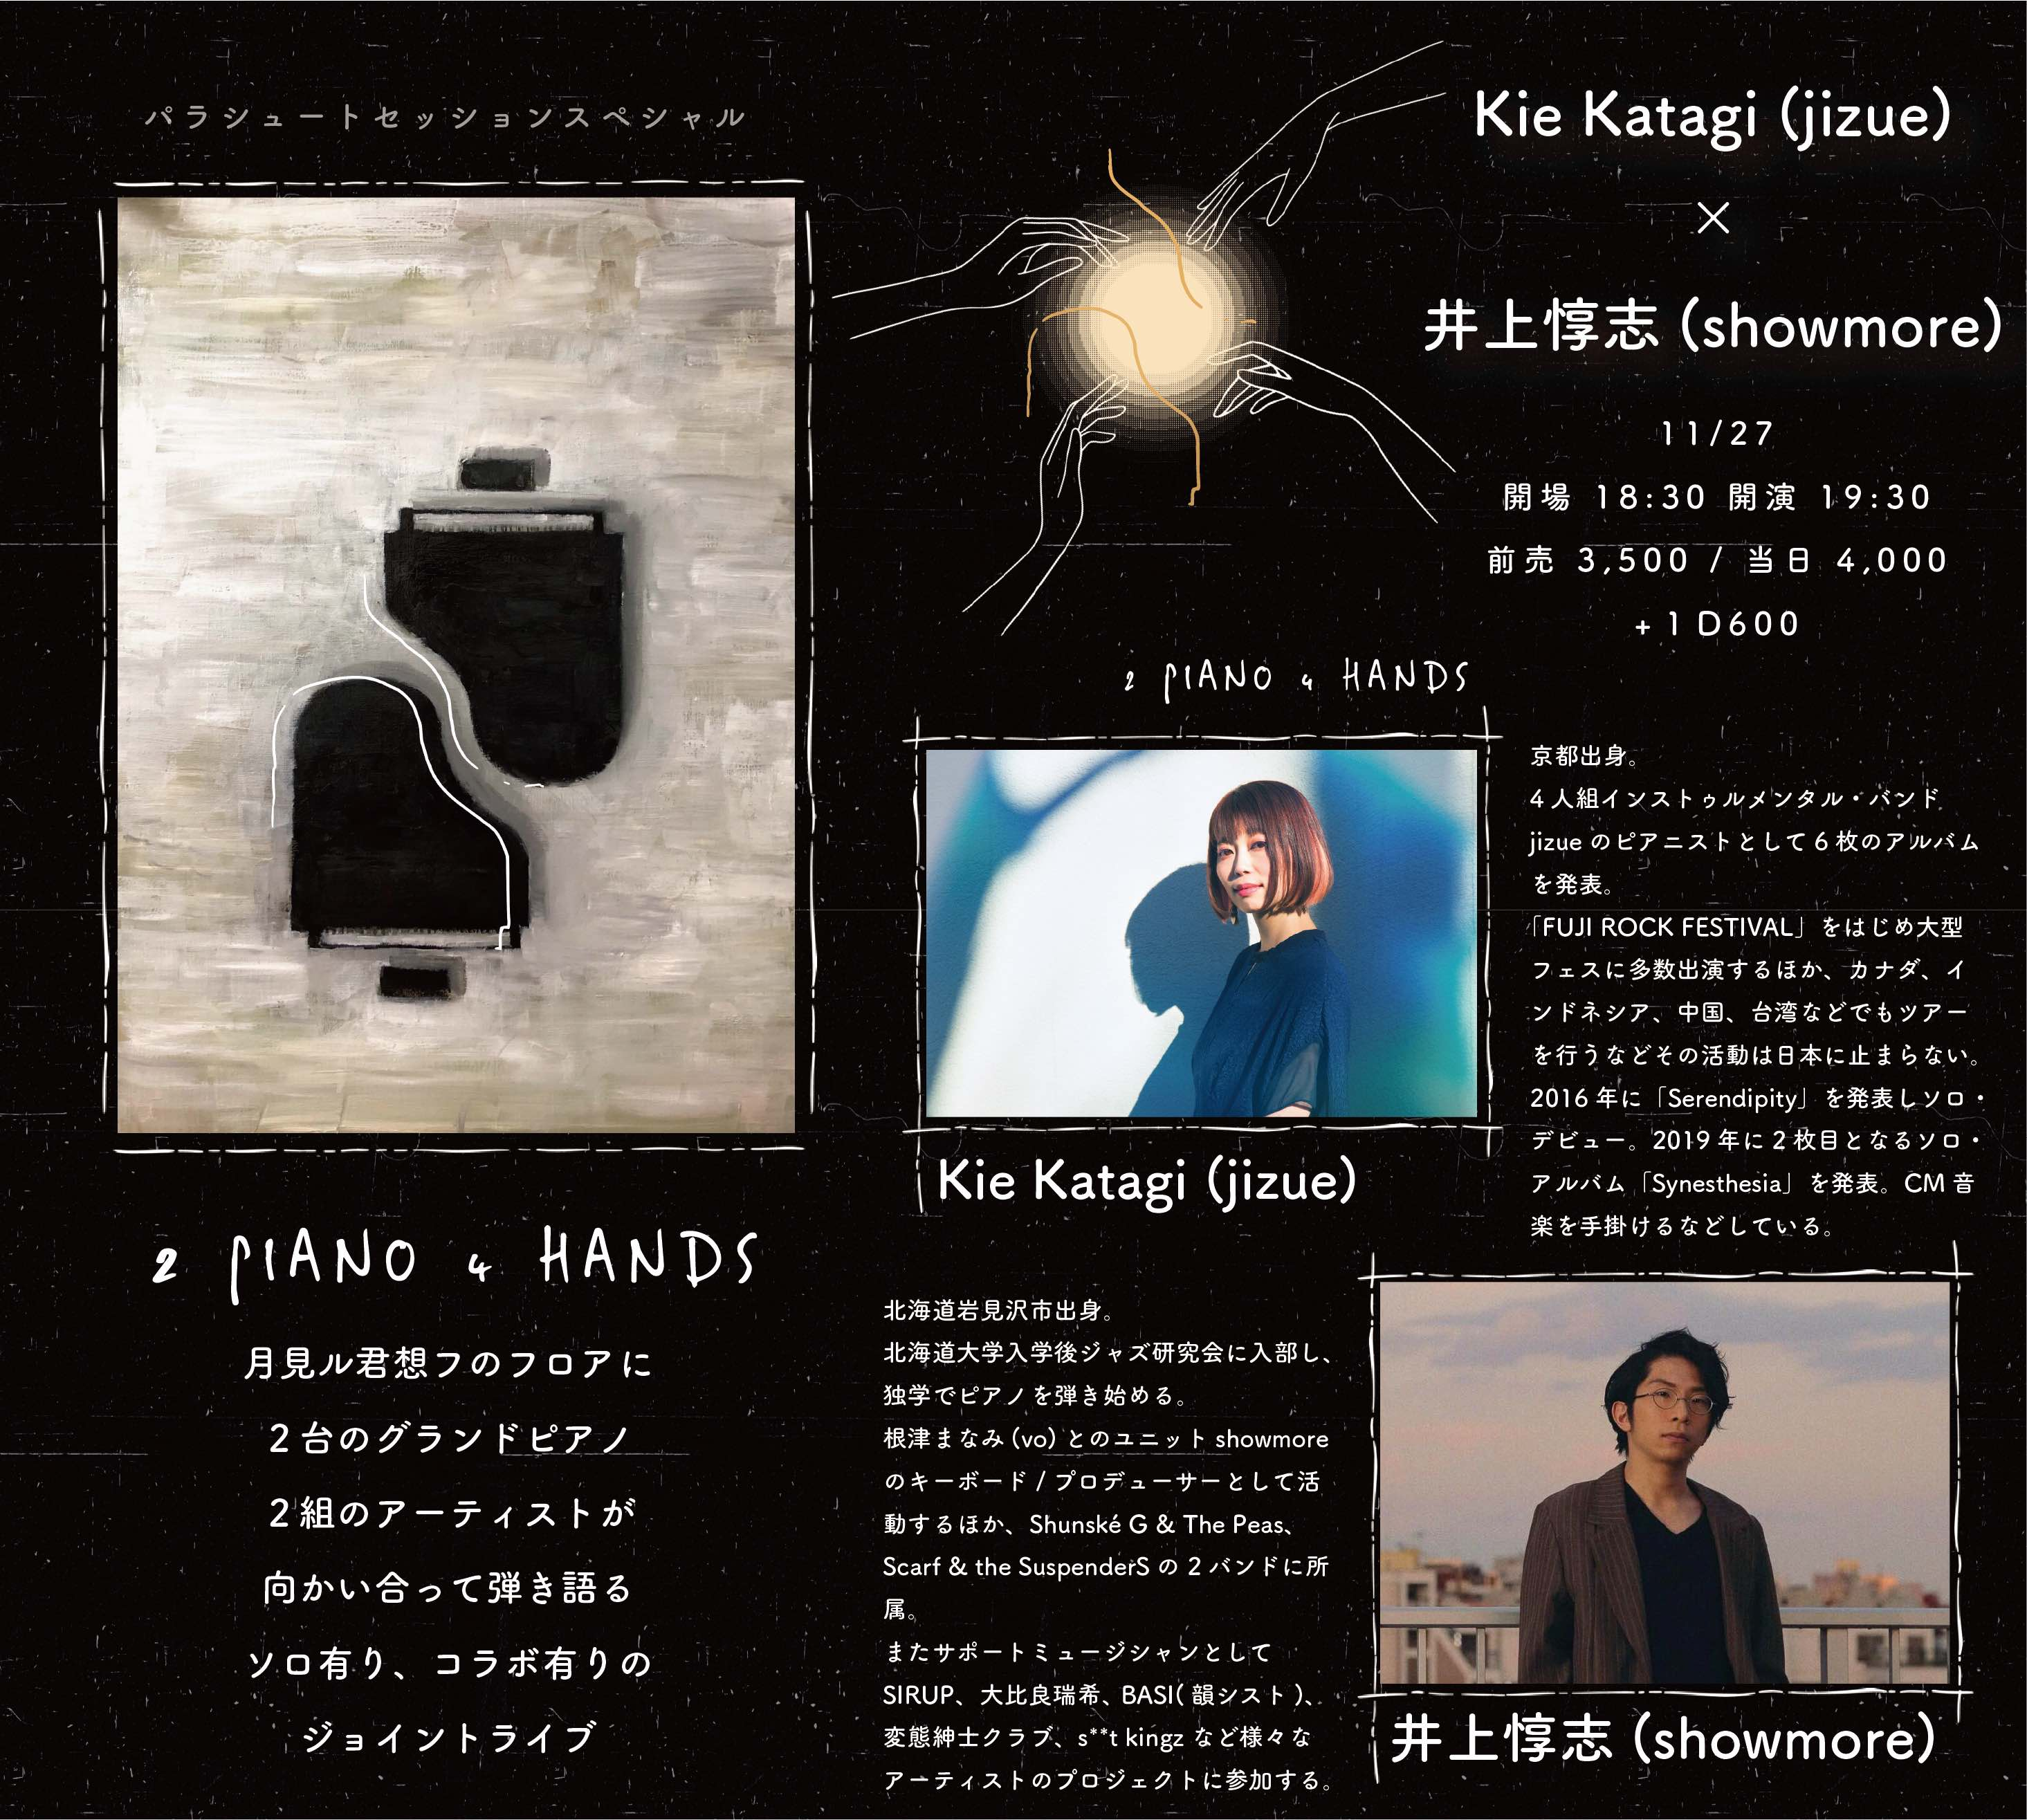 〖 2 PIANO 4 HANDS 〗vol.3 Kie Katagi × 井上惇志